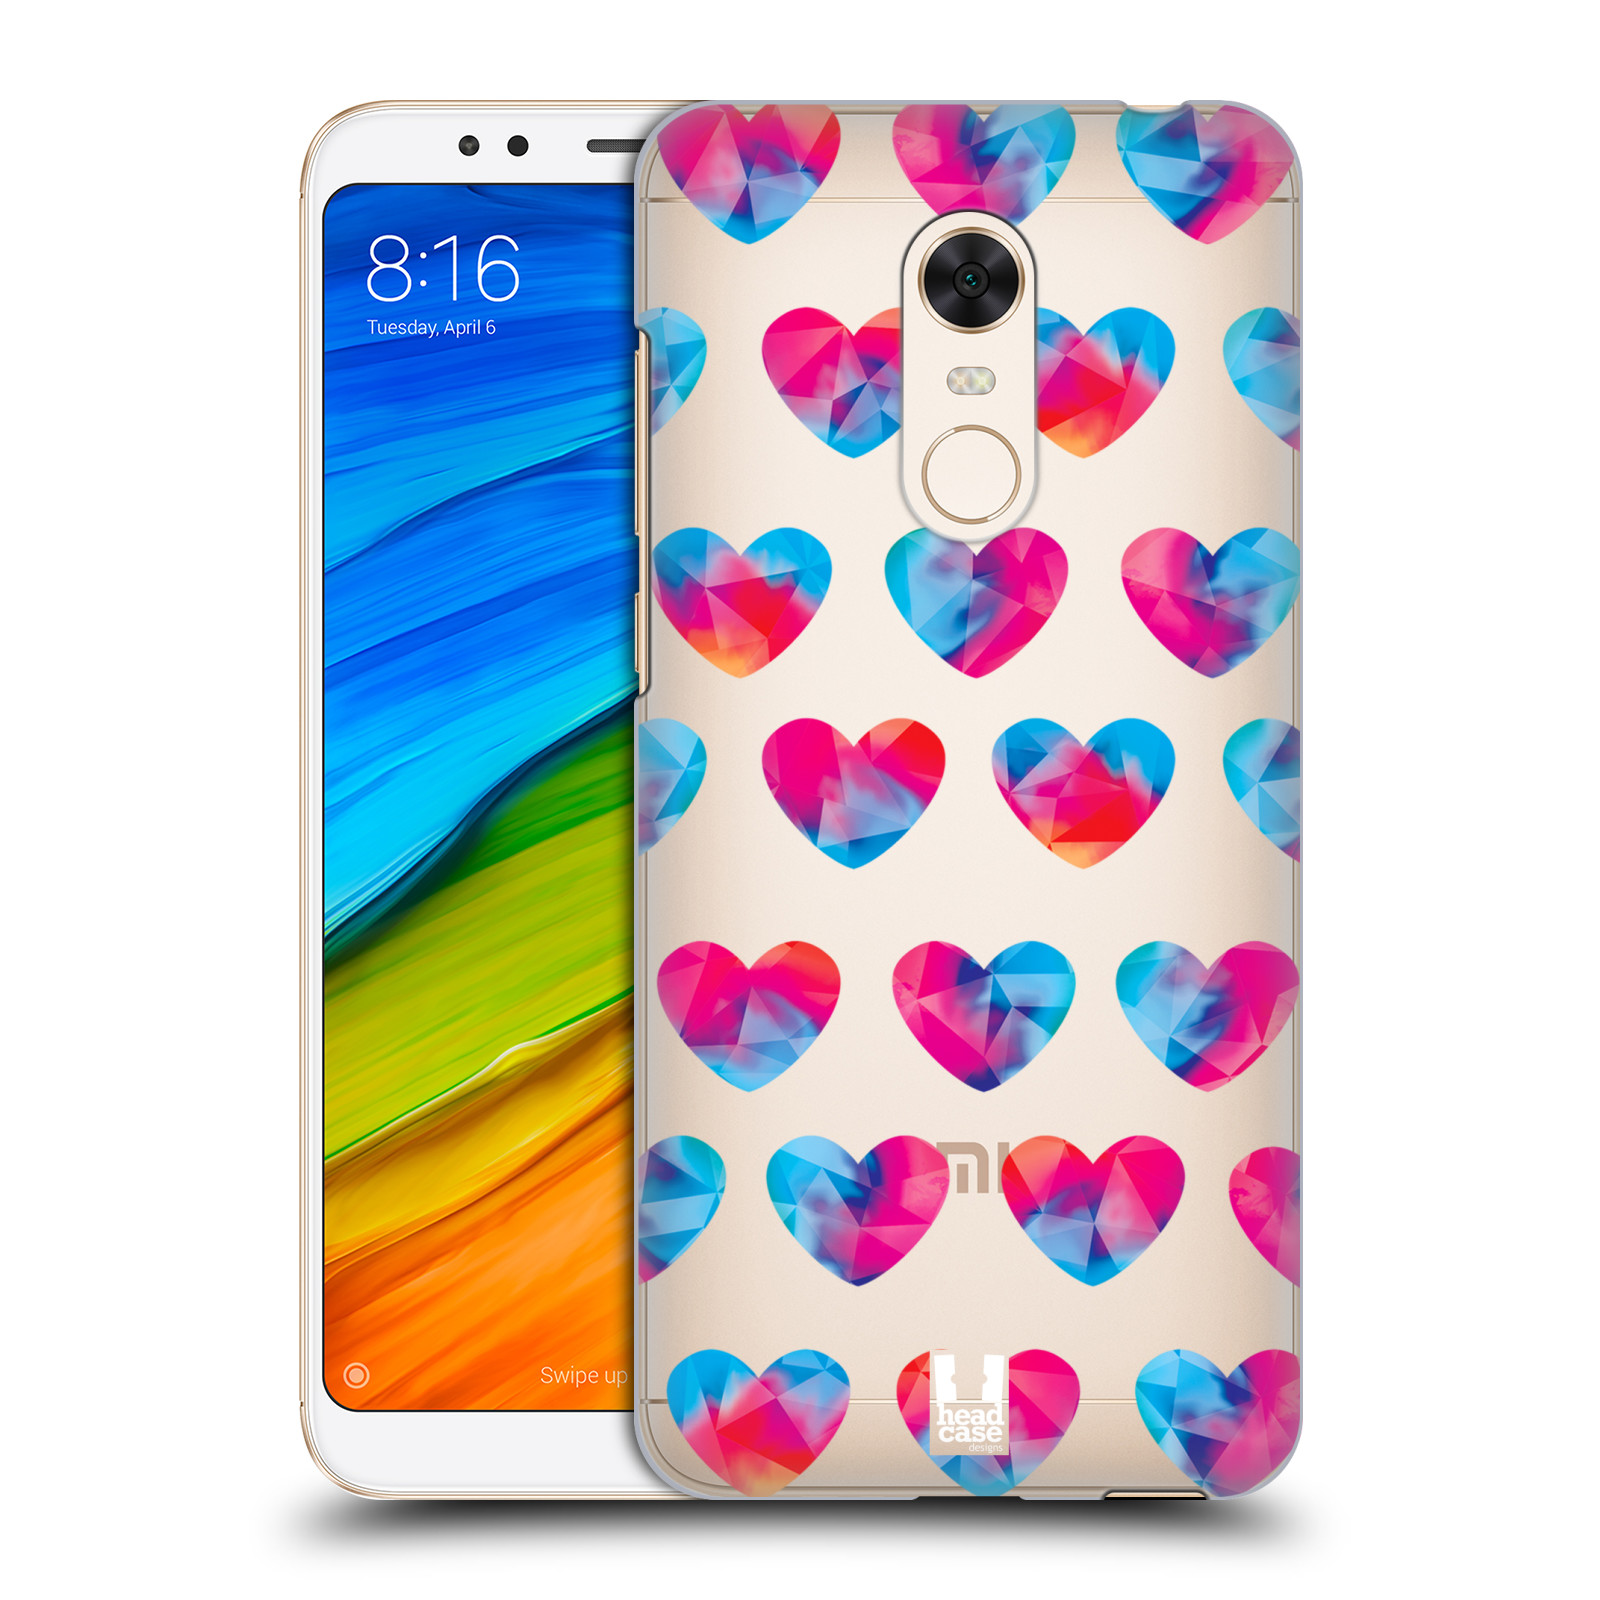 Plastové pouzdro na mobil Xiaomi Redmi 5 Plus - Head Case - Srdíčka hrající barvami